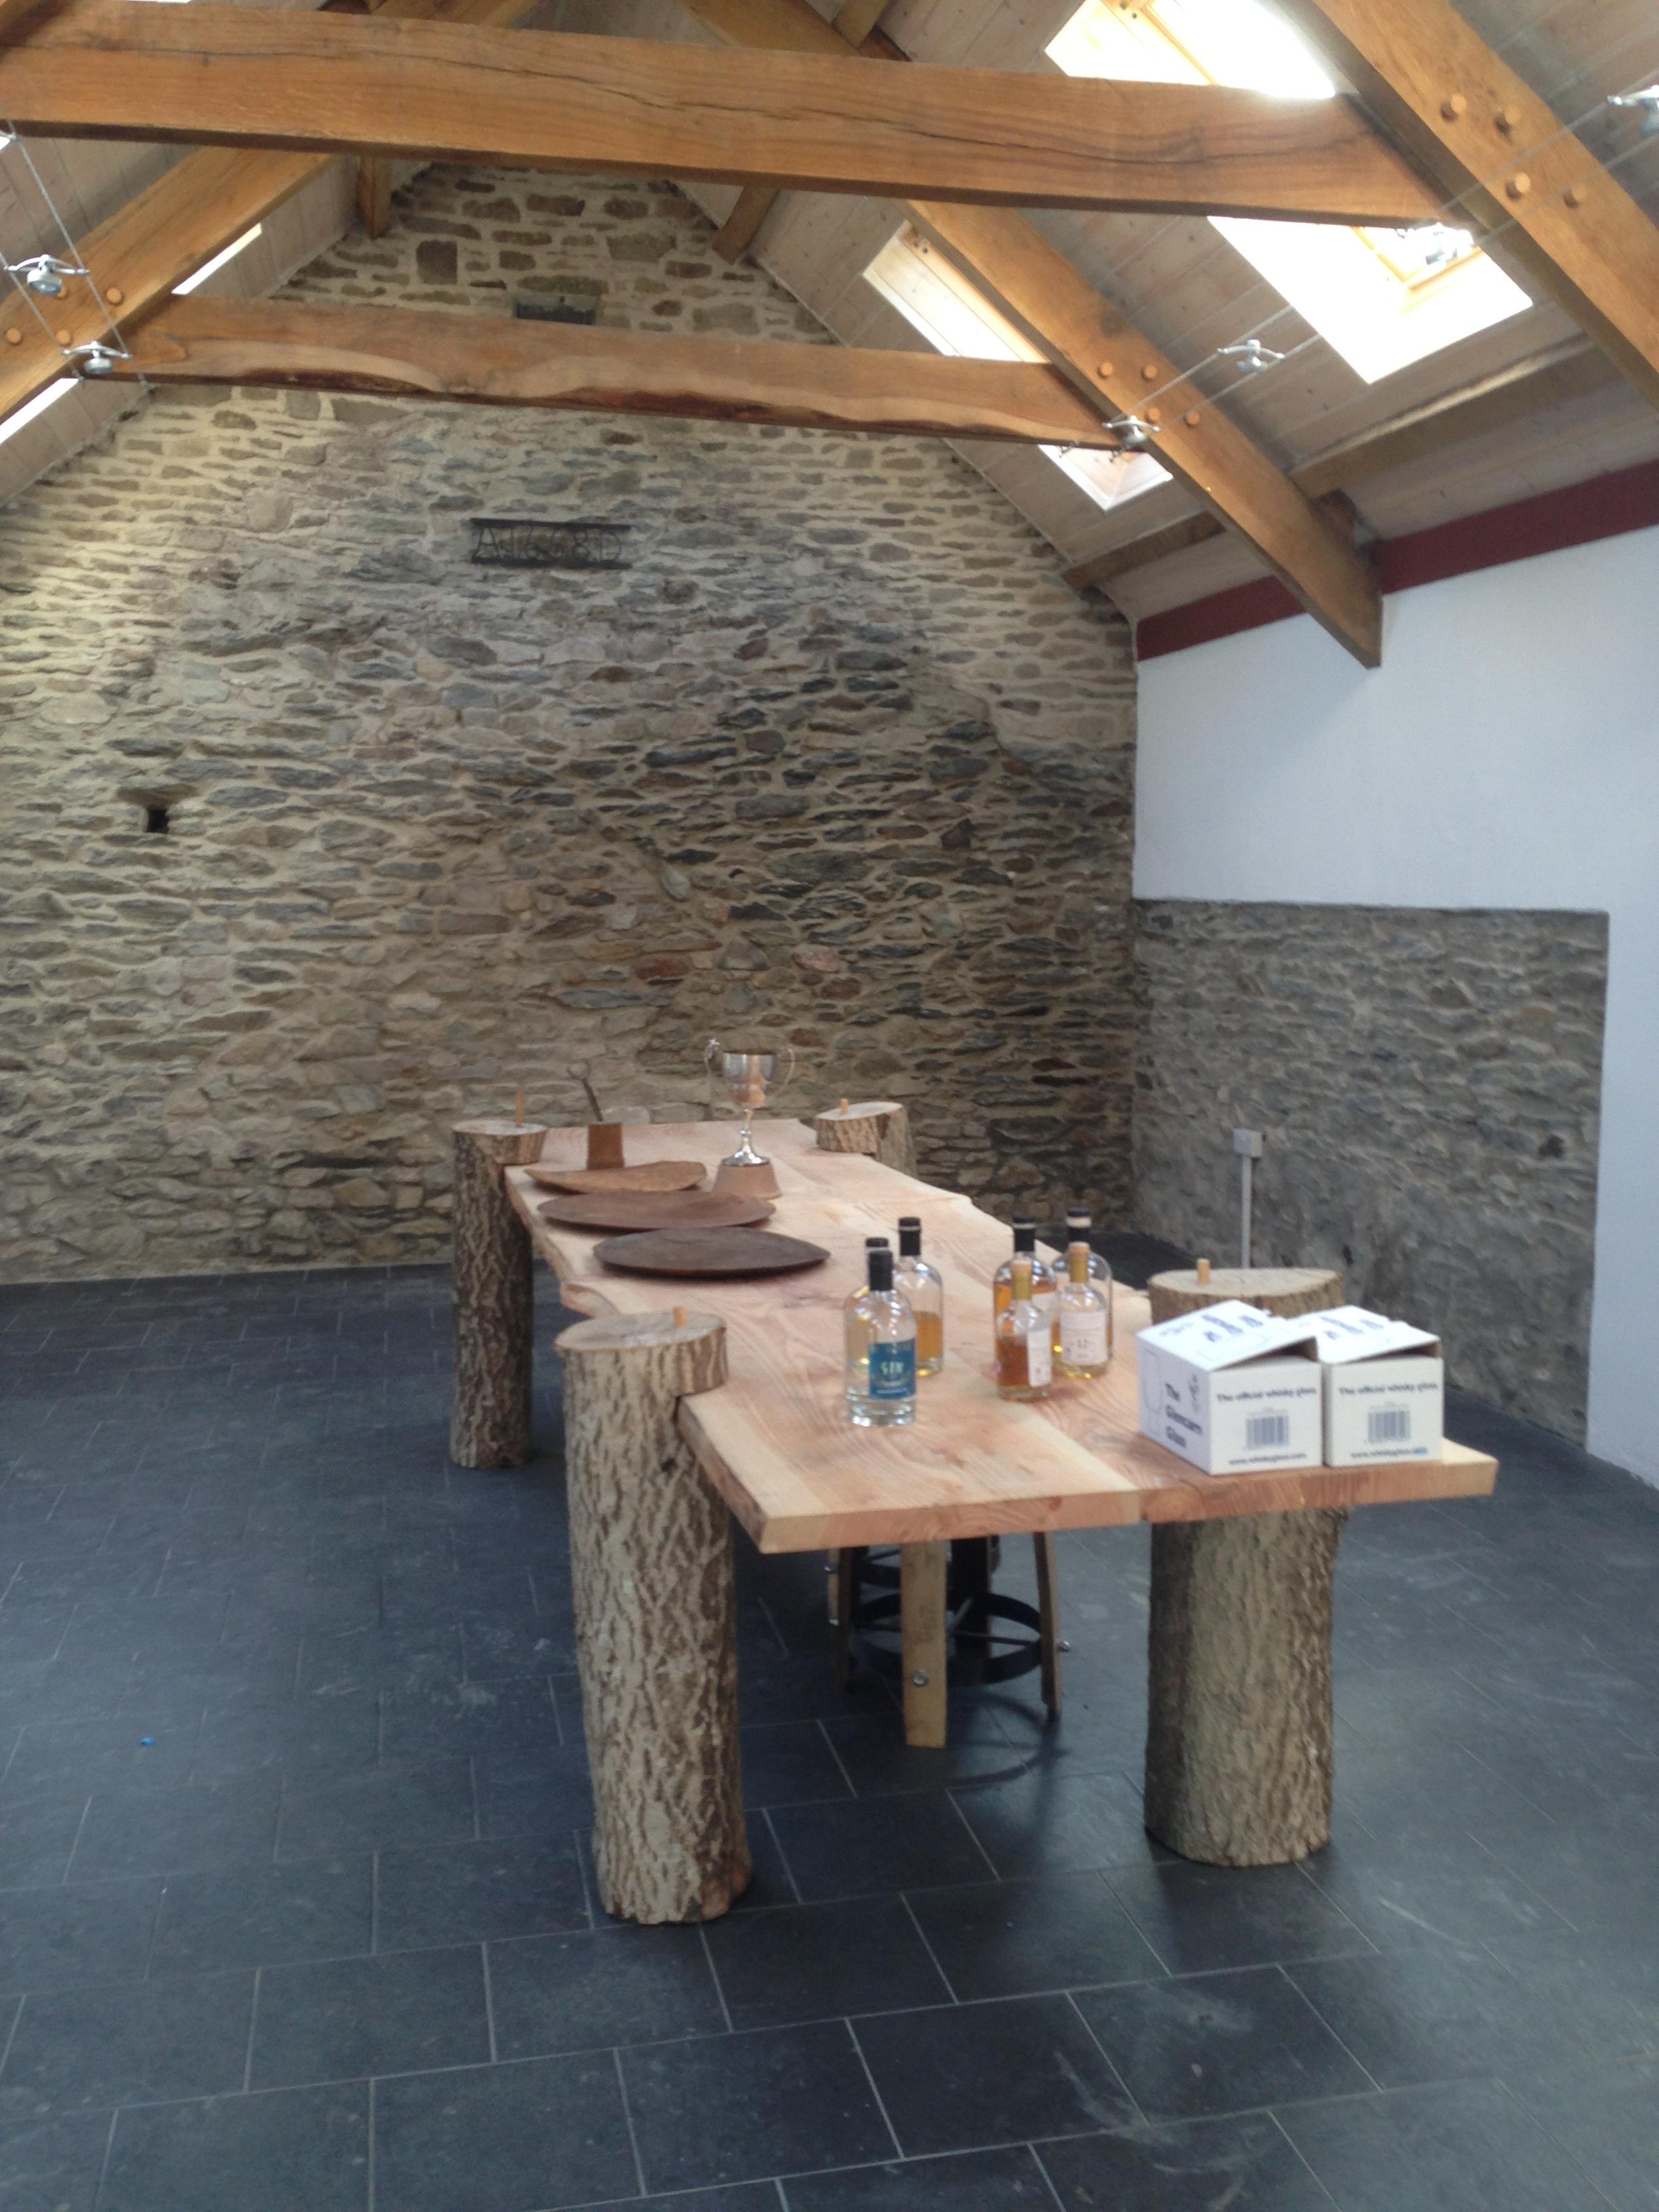 Wales Distillery